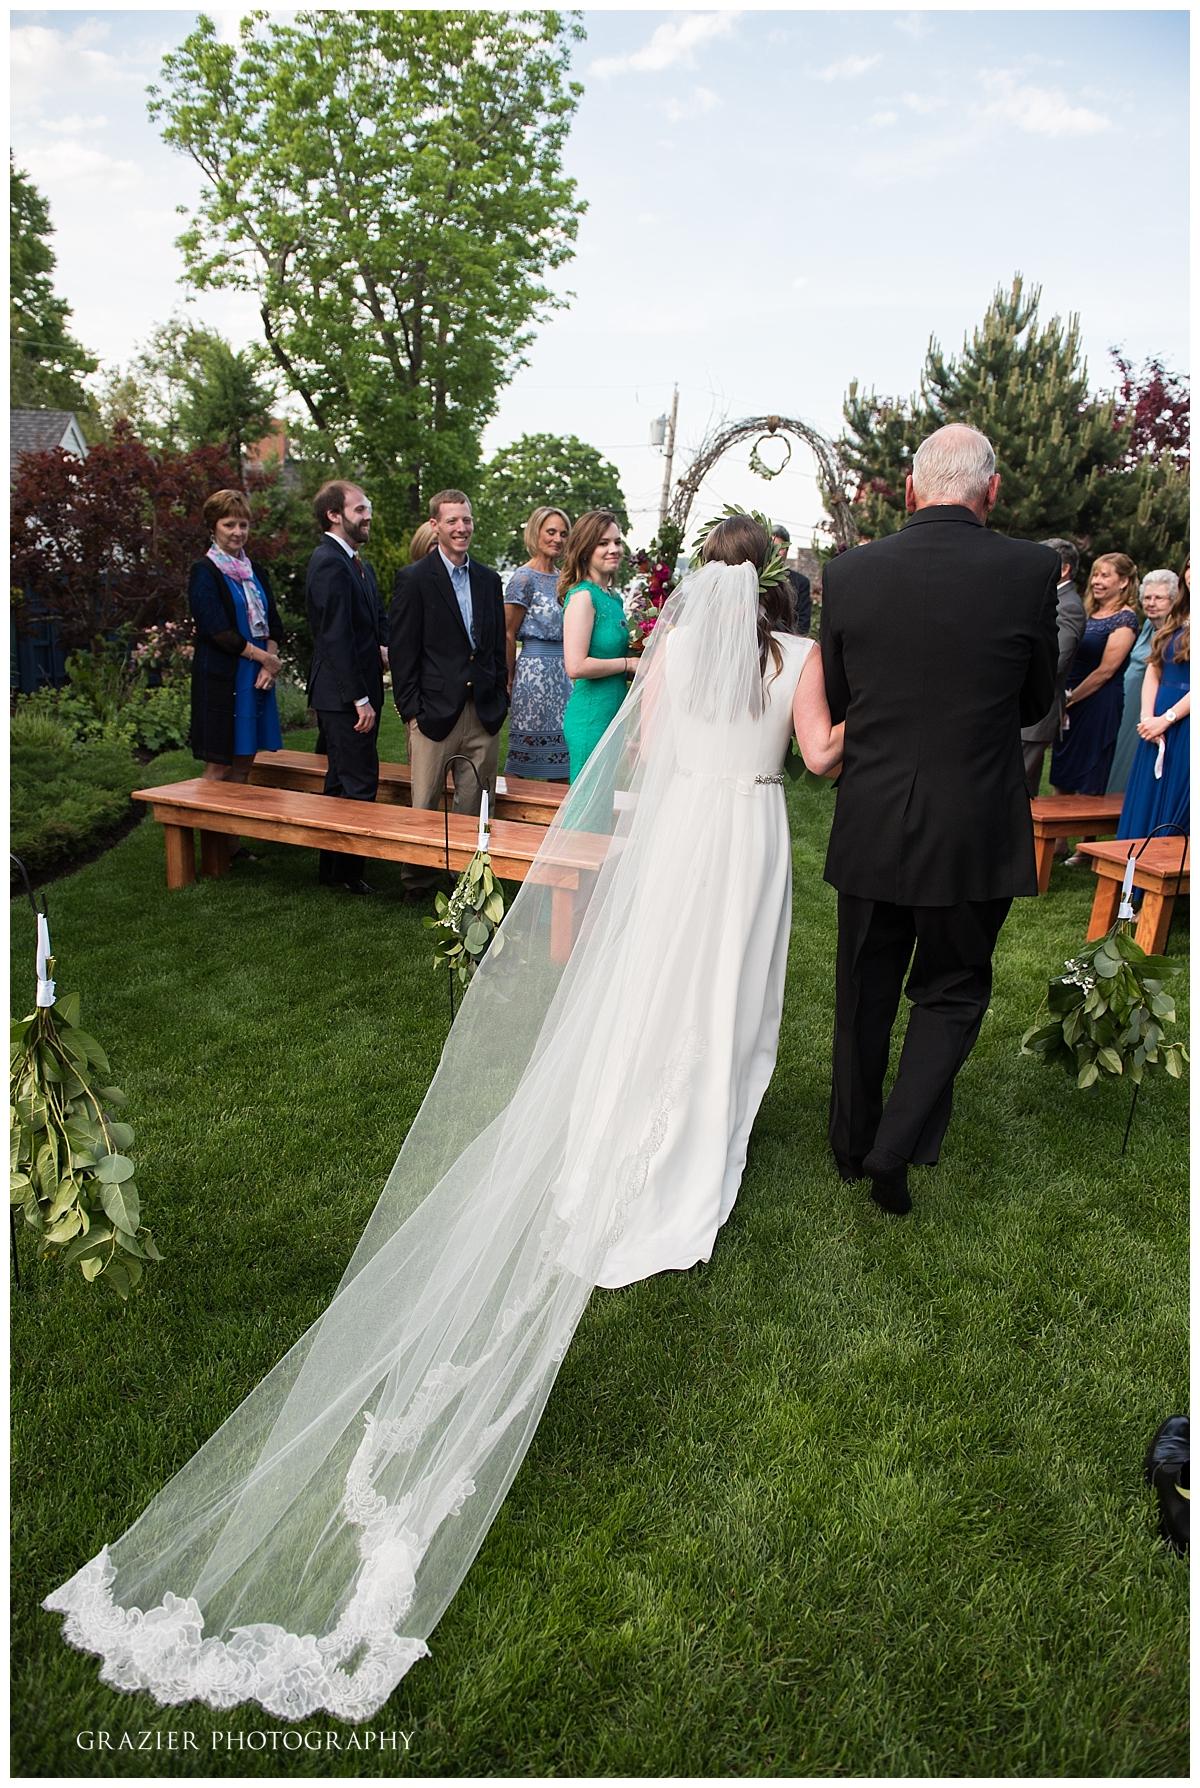 New Castle Wedding Grazier Photography 2017-40_WEB.jpg